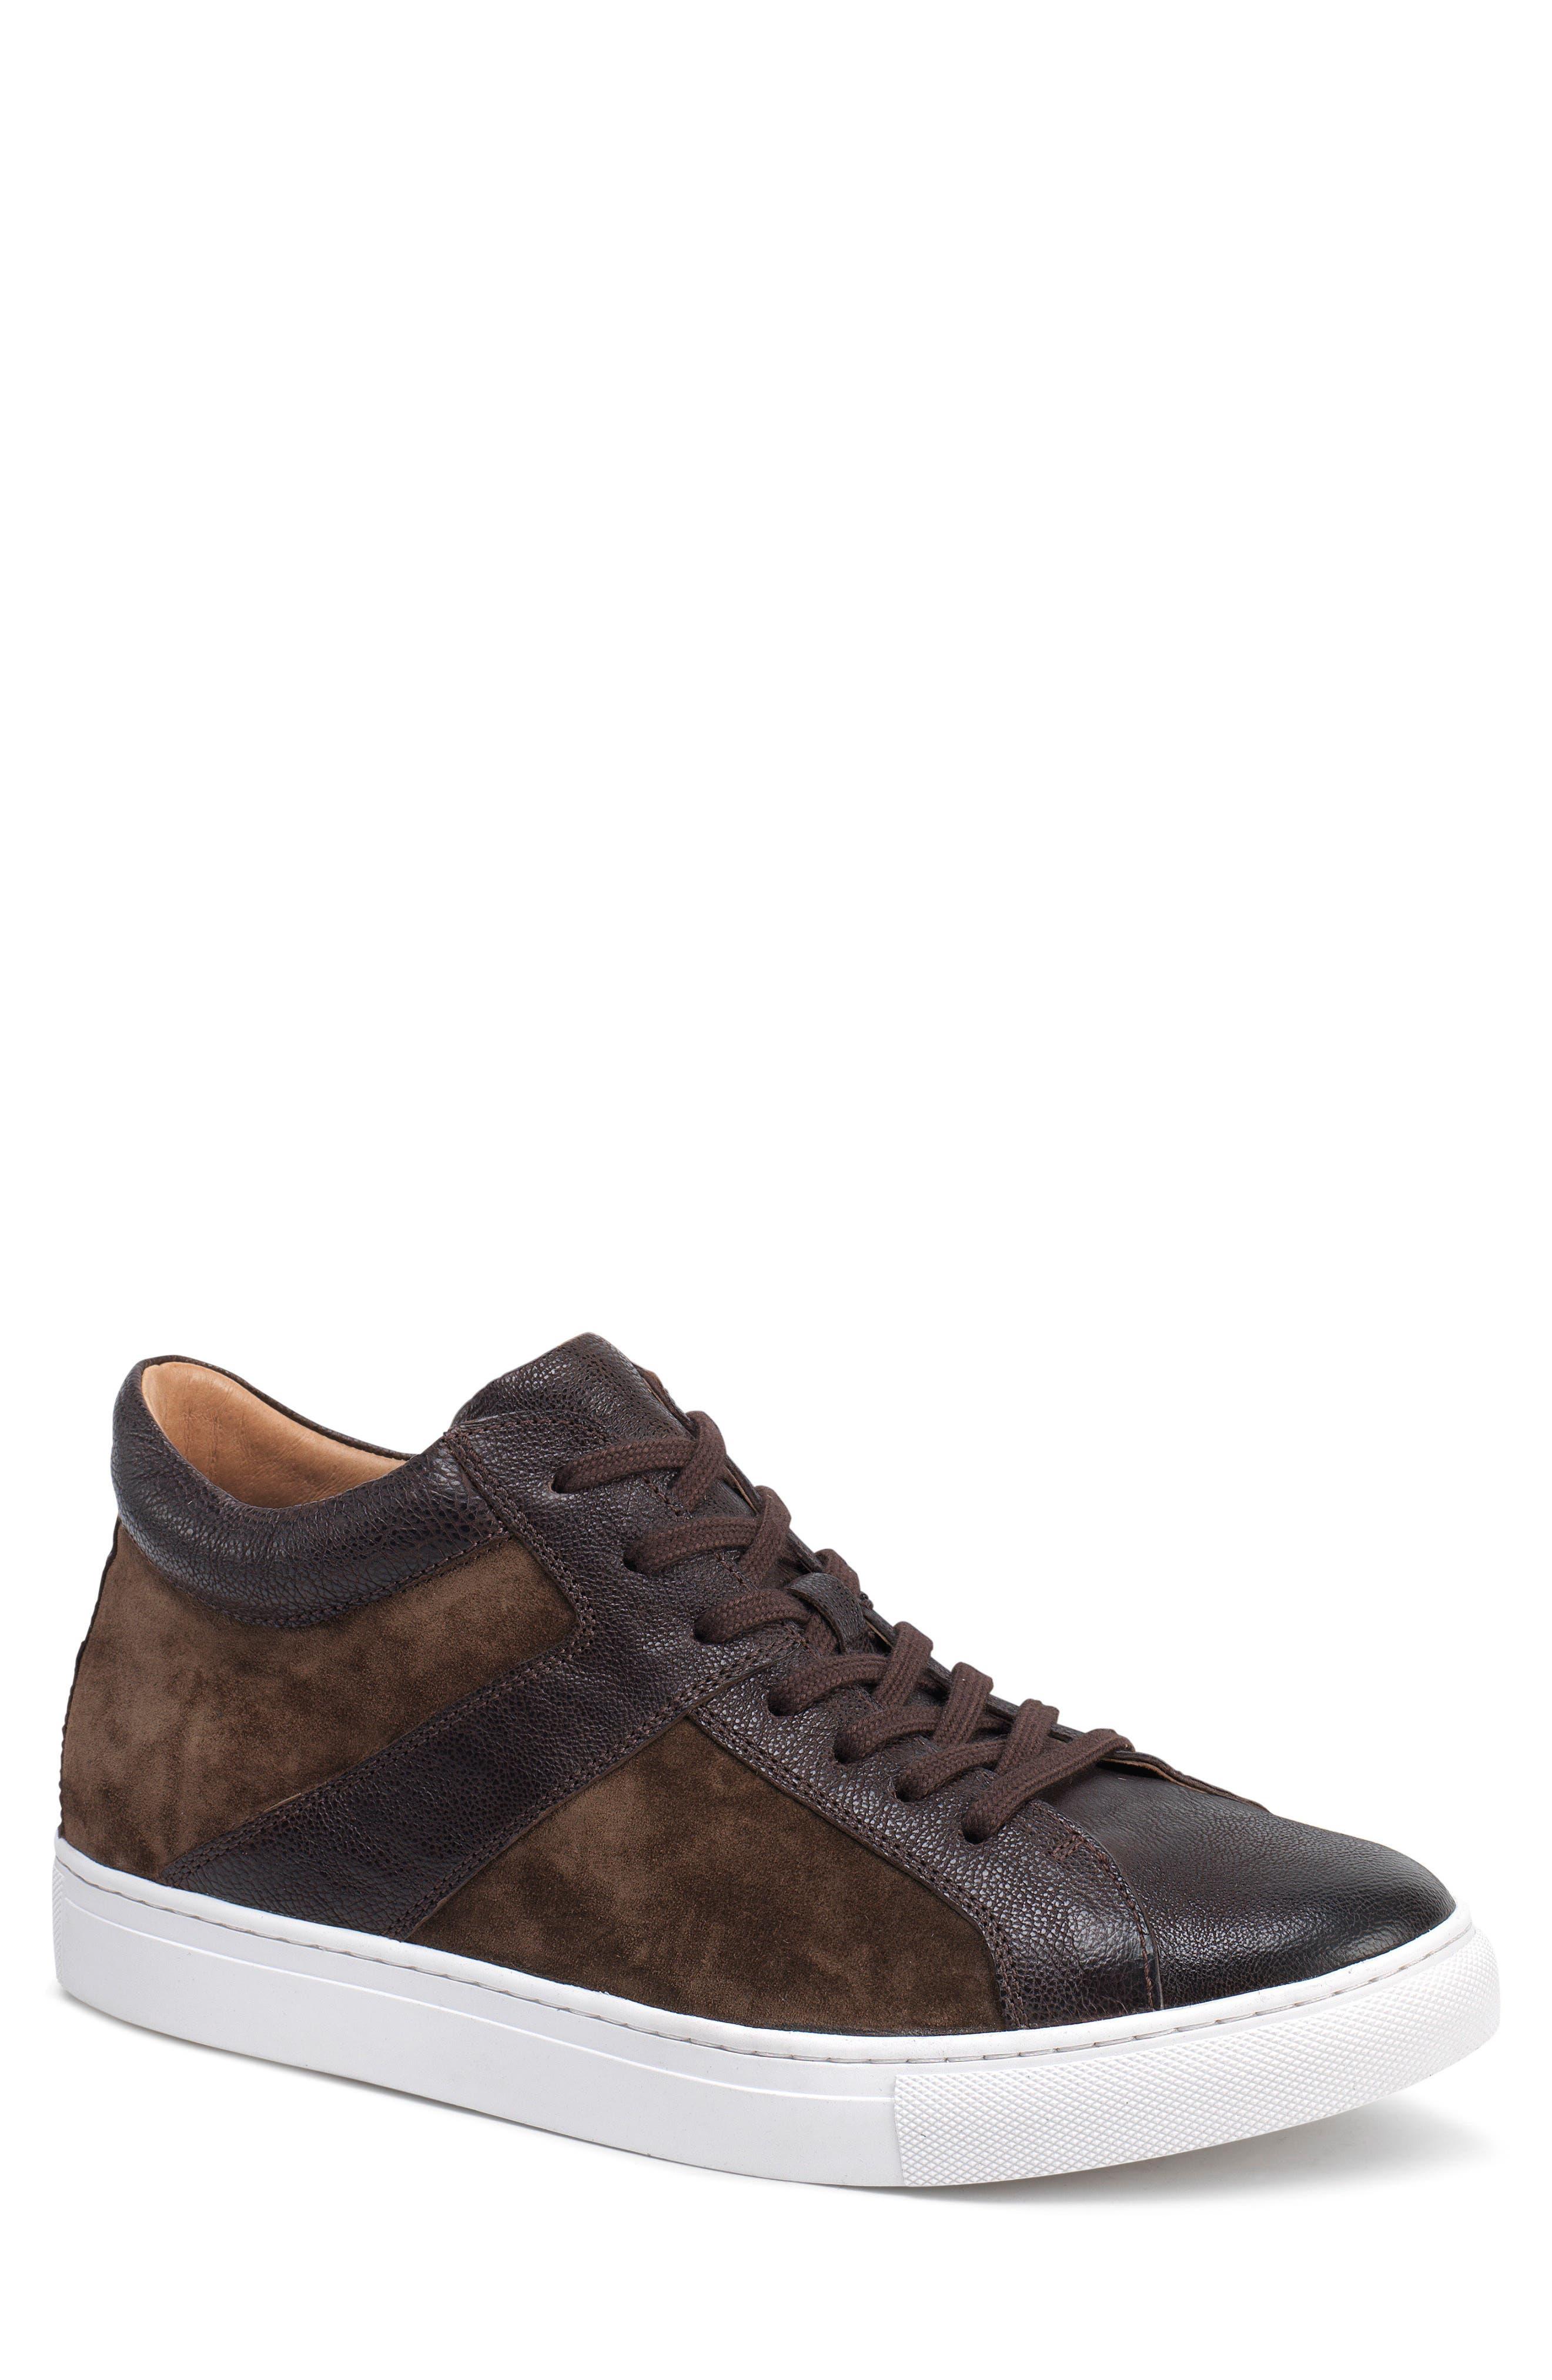 Alec Sneaker,                             Main thumbnail 1, color,                             DARK BROWN LEATHER/SUEDE